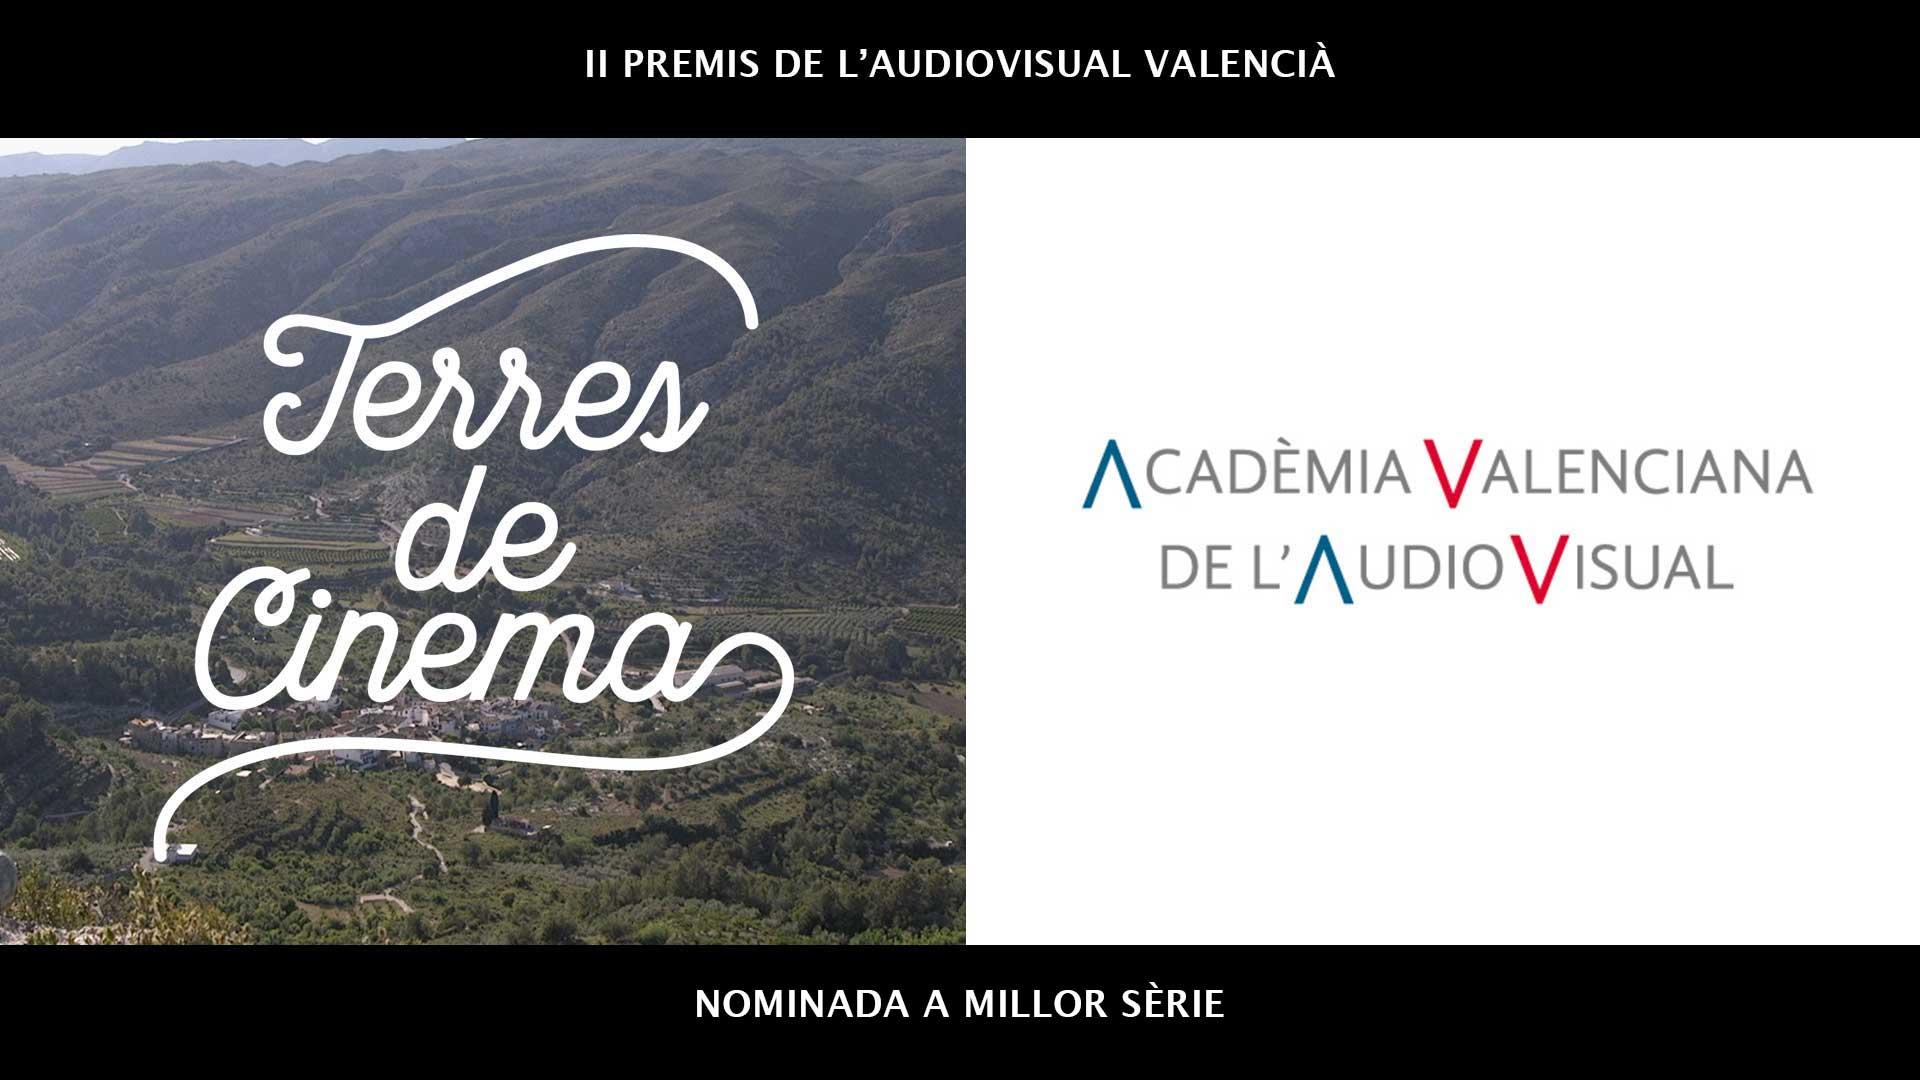 Premis Audiovisual Valencià - Terres de Cinema